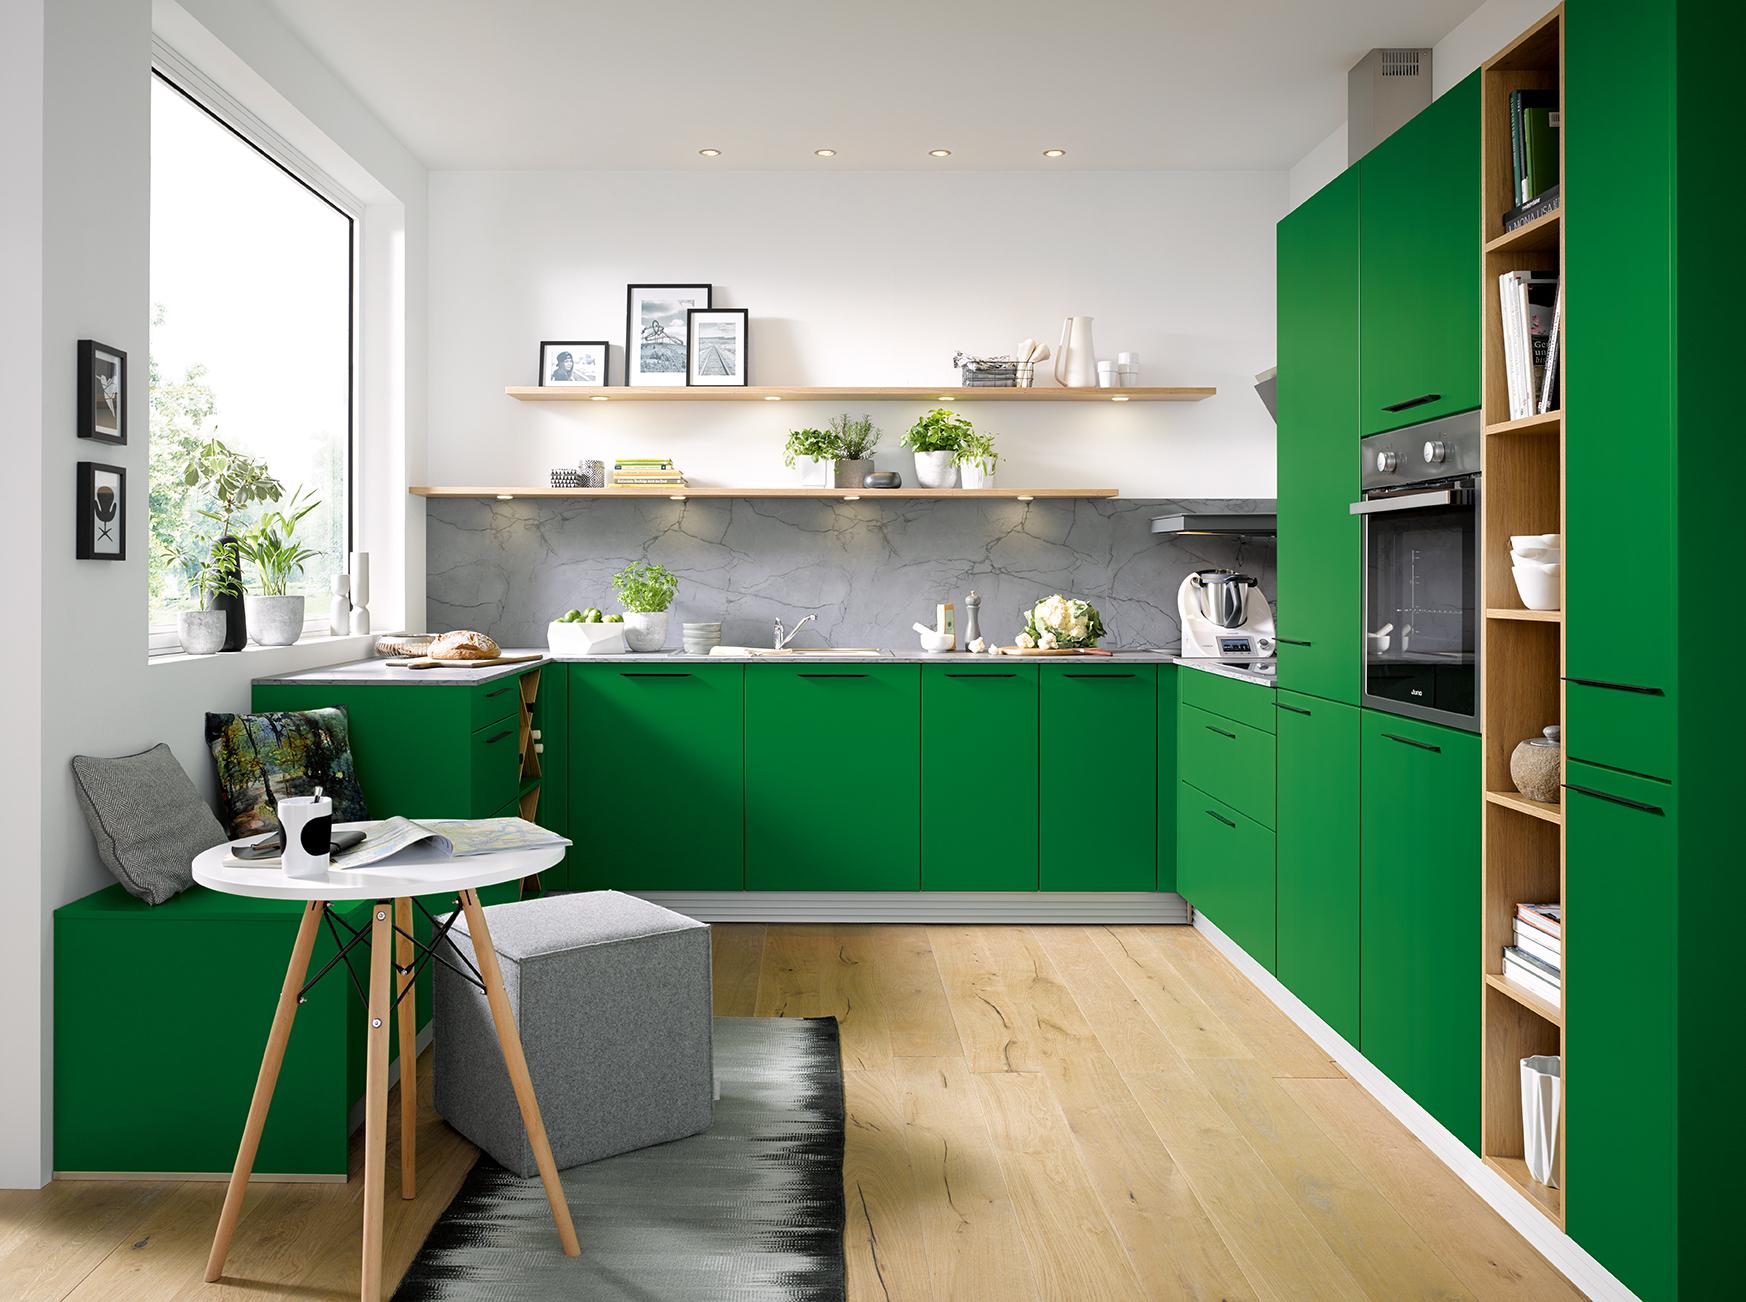 German Kitchens Online Uk